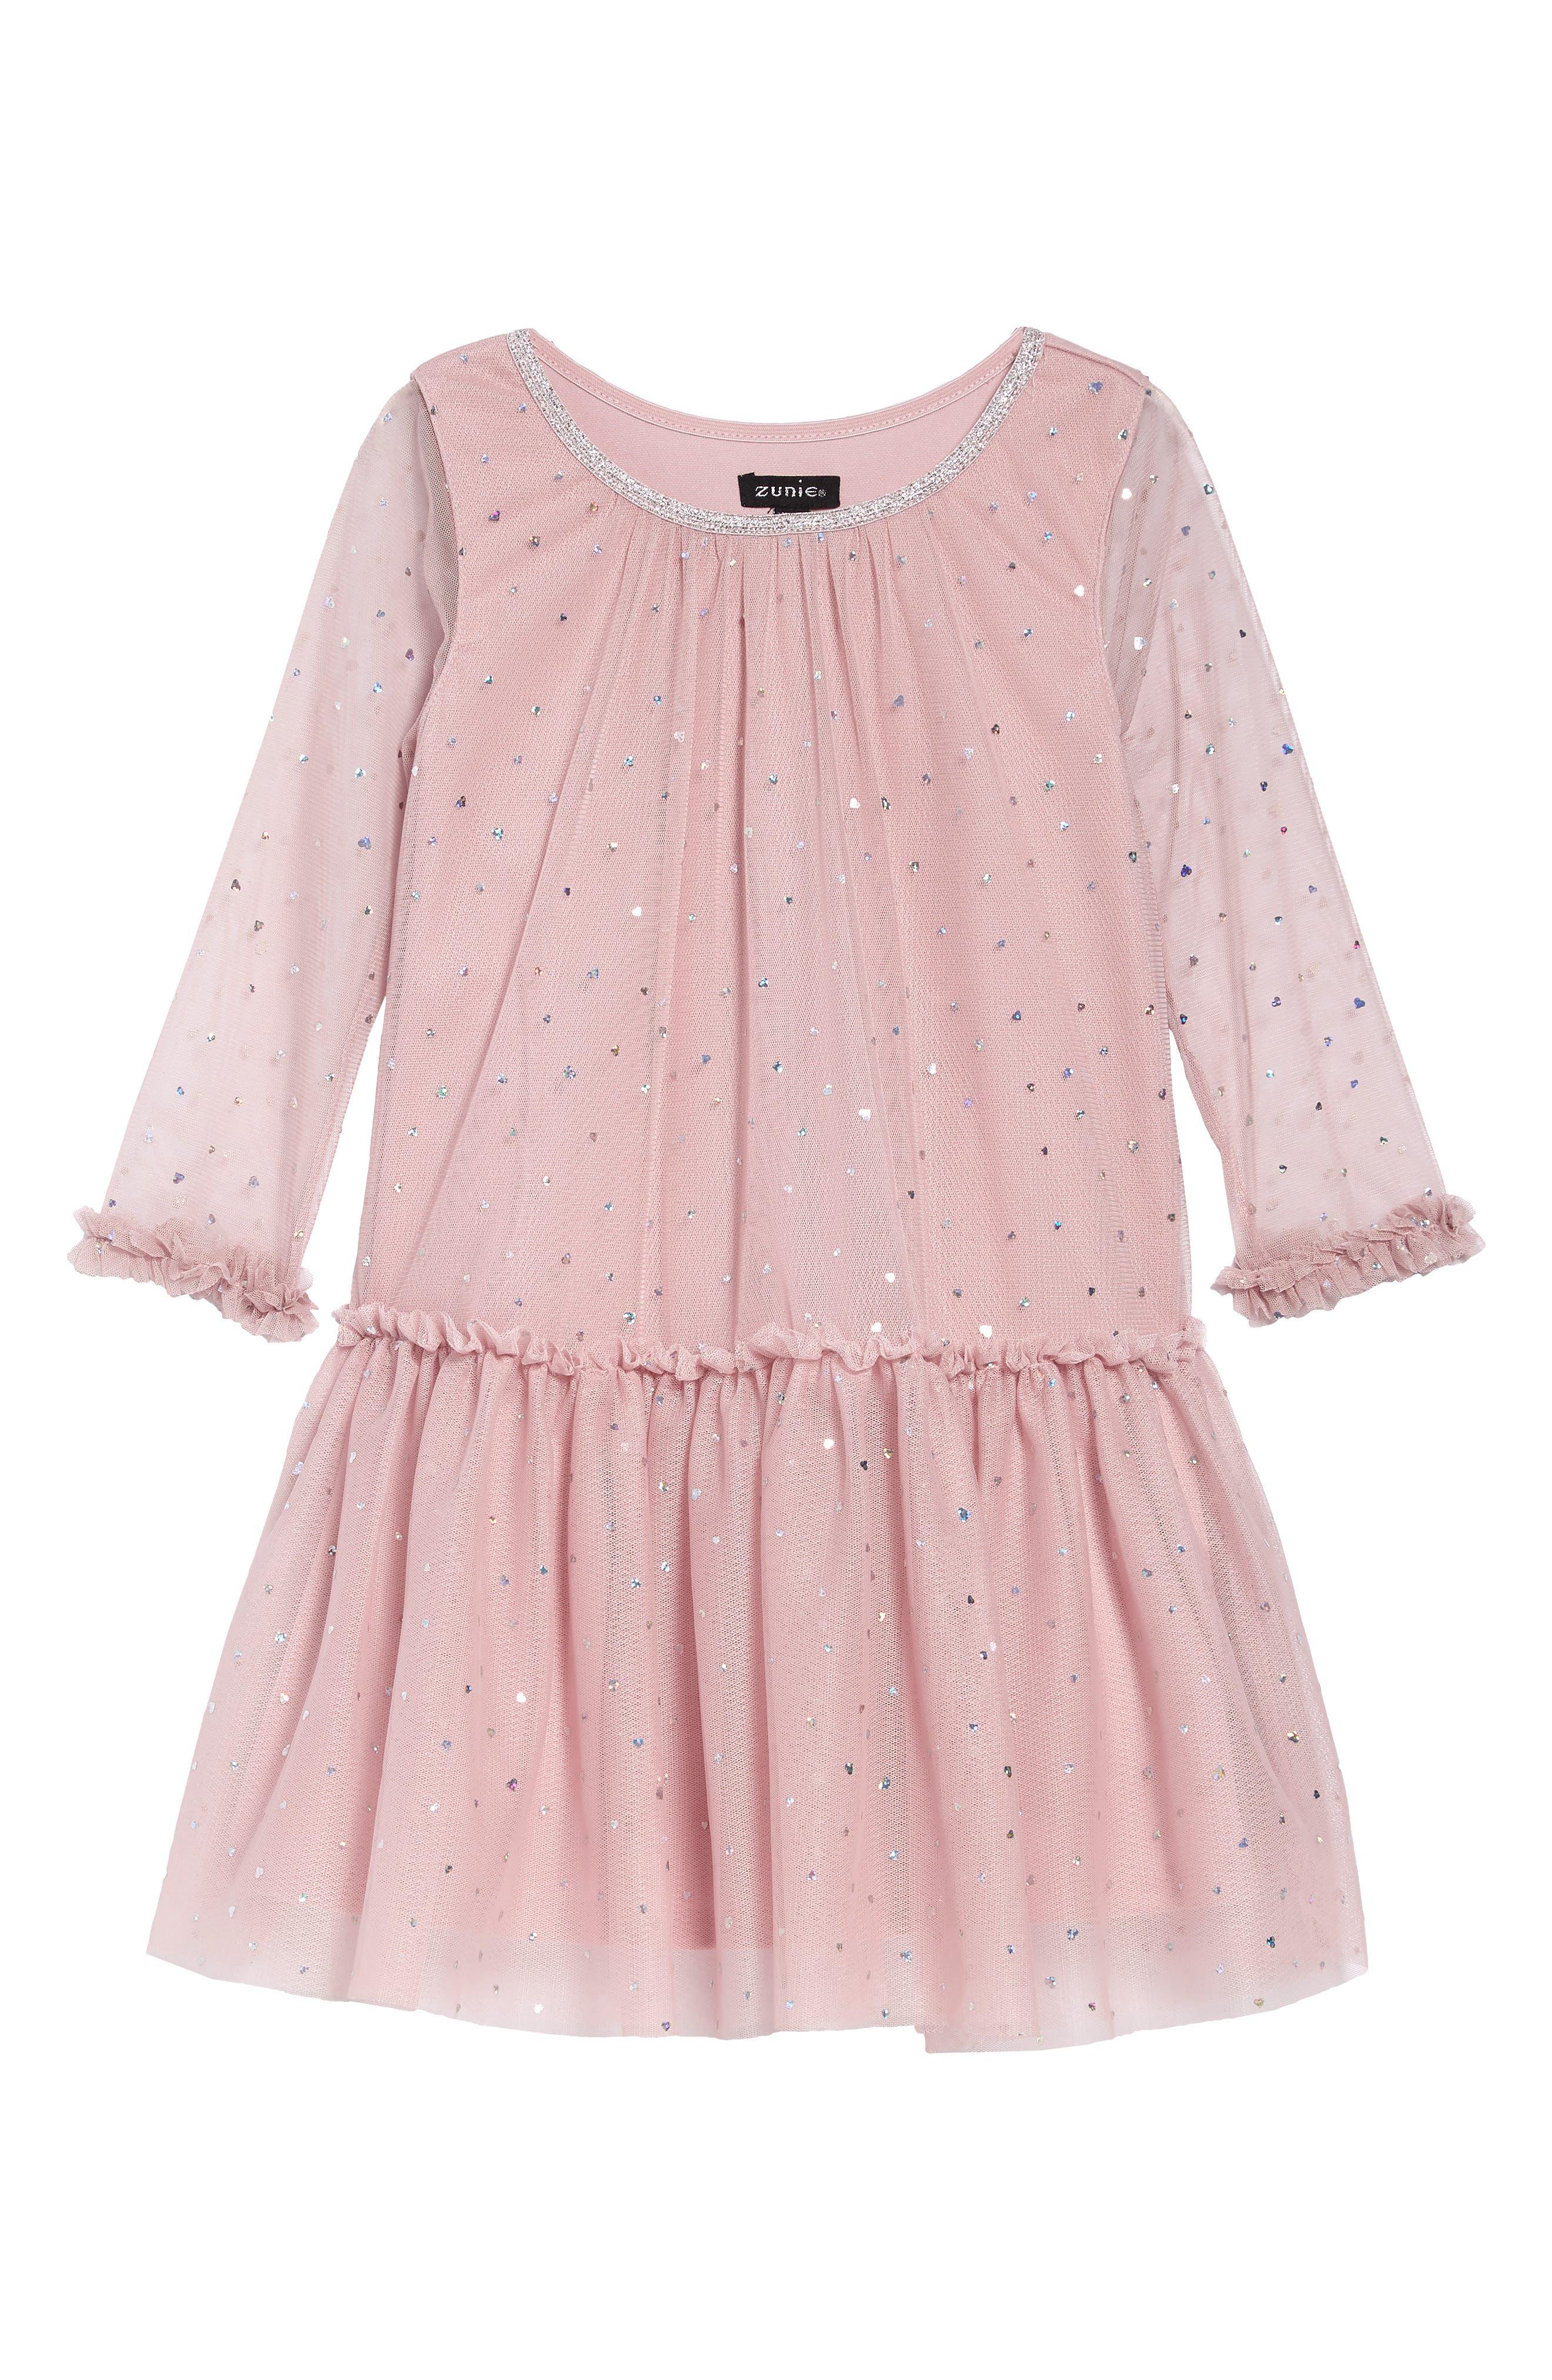 1920s Children Fashions: Girls, Boys, Baby Costumes Toddler Girls Zunie Sequin Tulle Drop Waist Dress Size 3T - Pink $28.80 AT vintagedancer.com